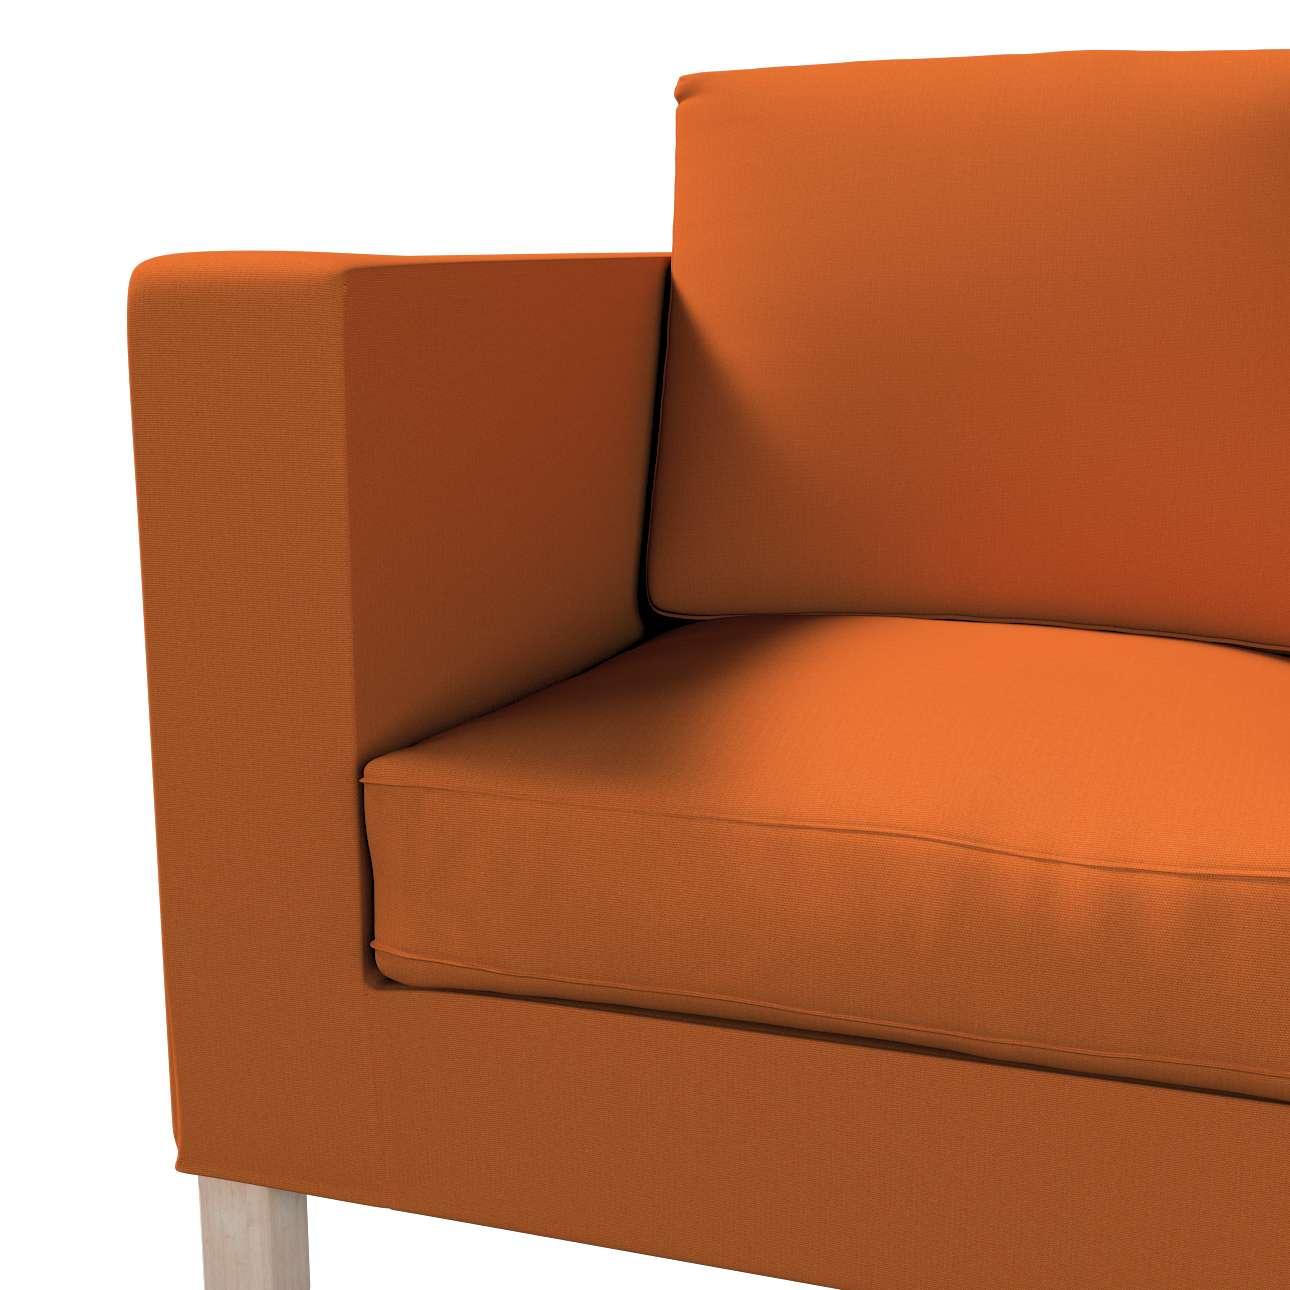 Karlanda klädsel<br>2-sits soffa - kort klädsel i kollektionen Panama Cotton, Tyg: 702-42